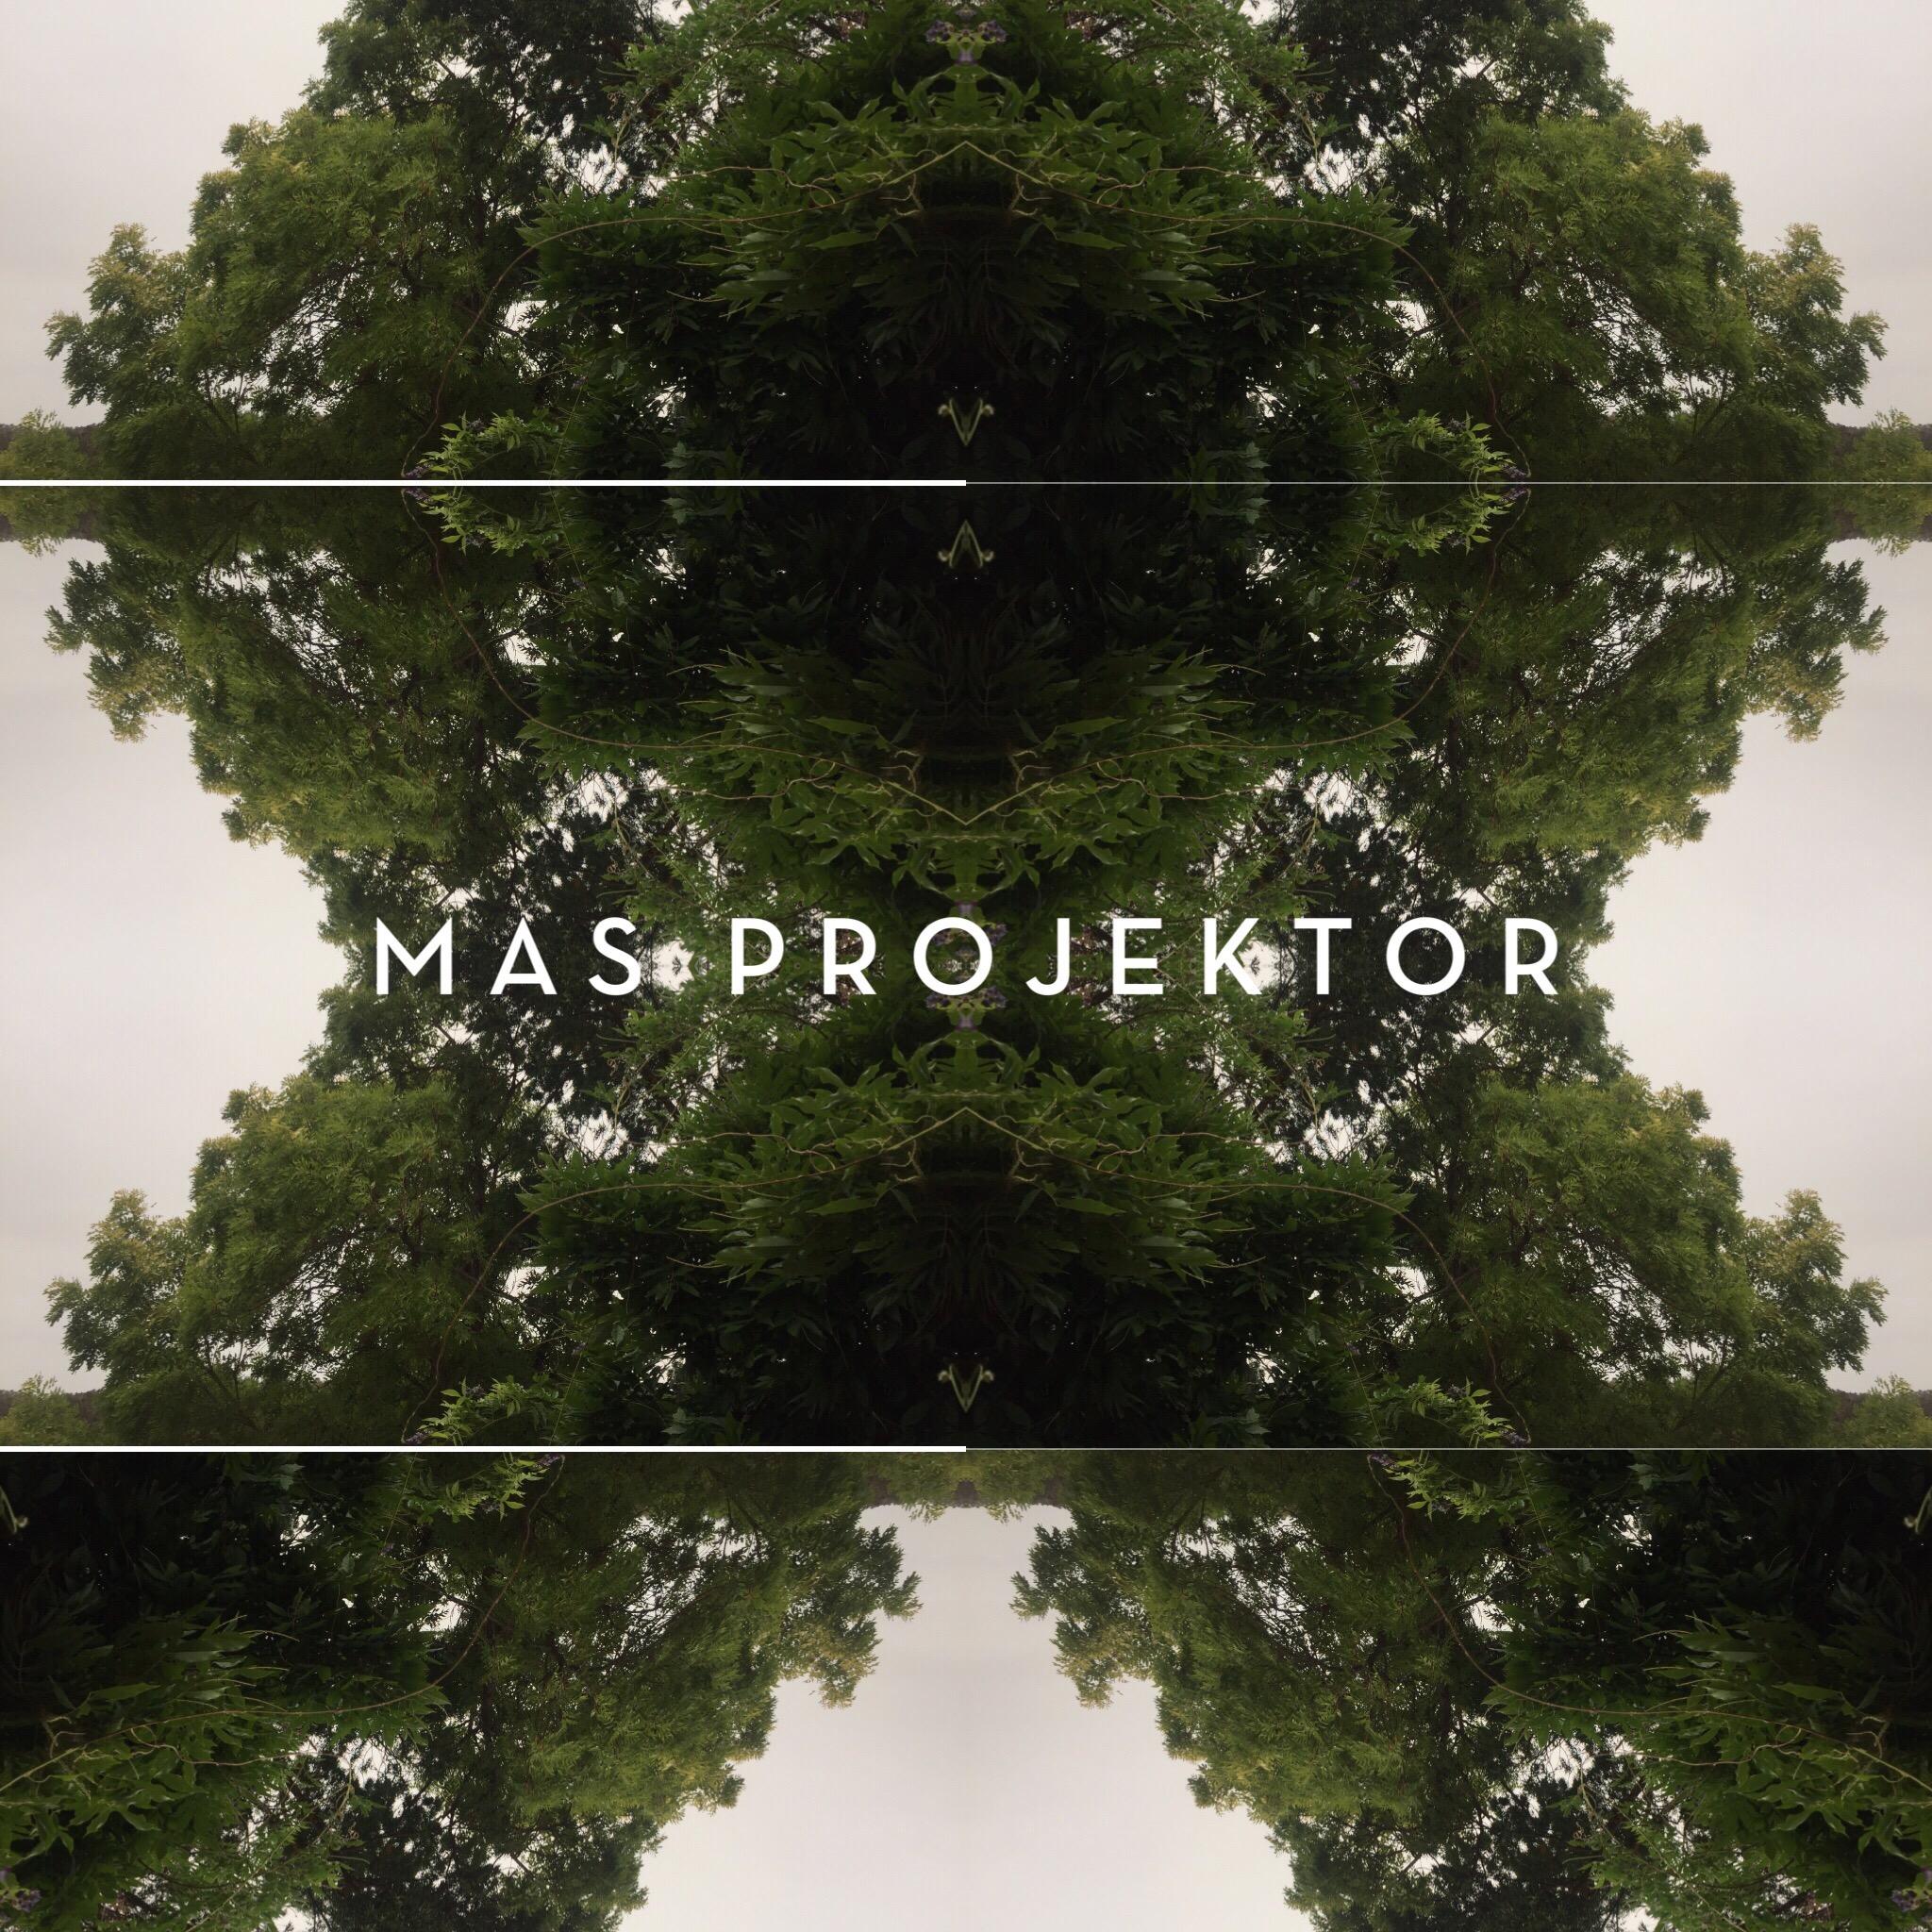 Mas Projektor - The Mirror and The Sea  - Liveset 1 (2020)